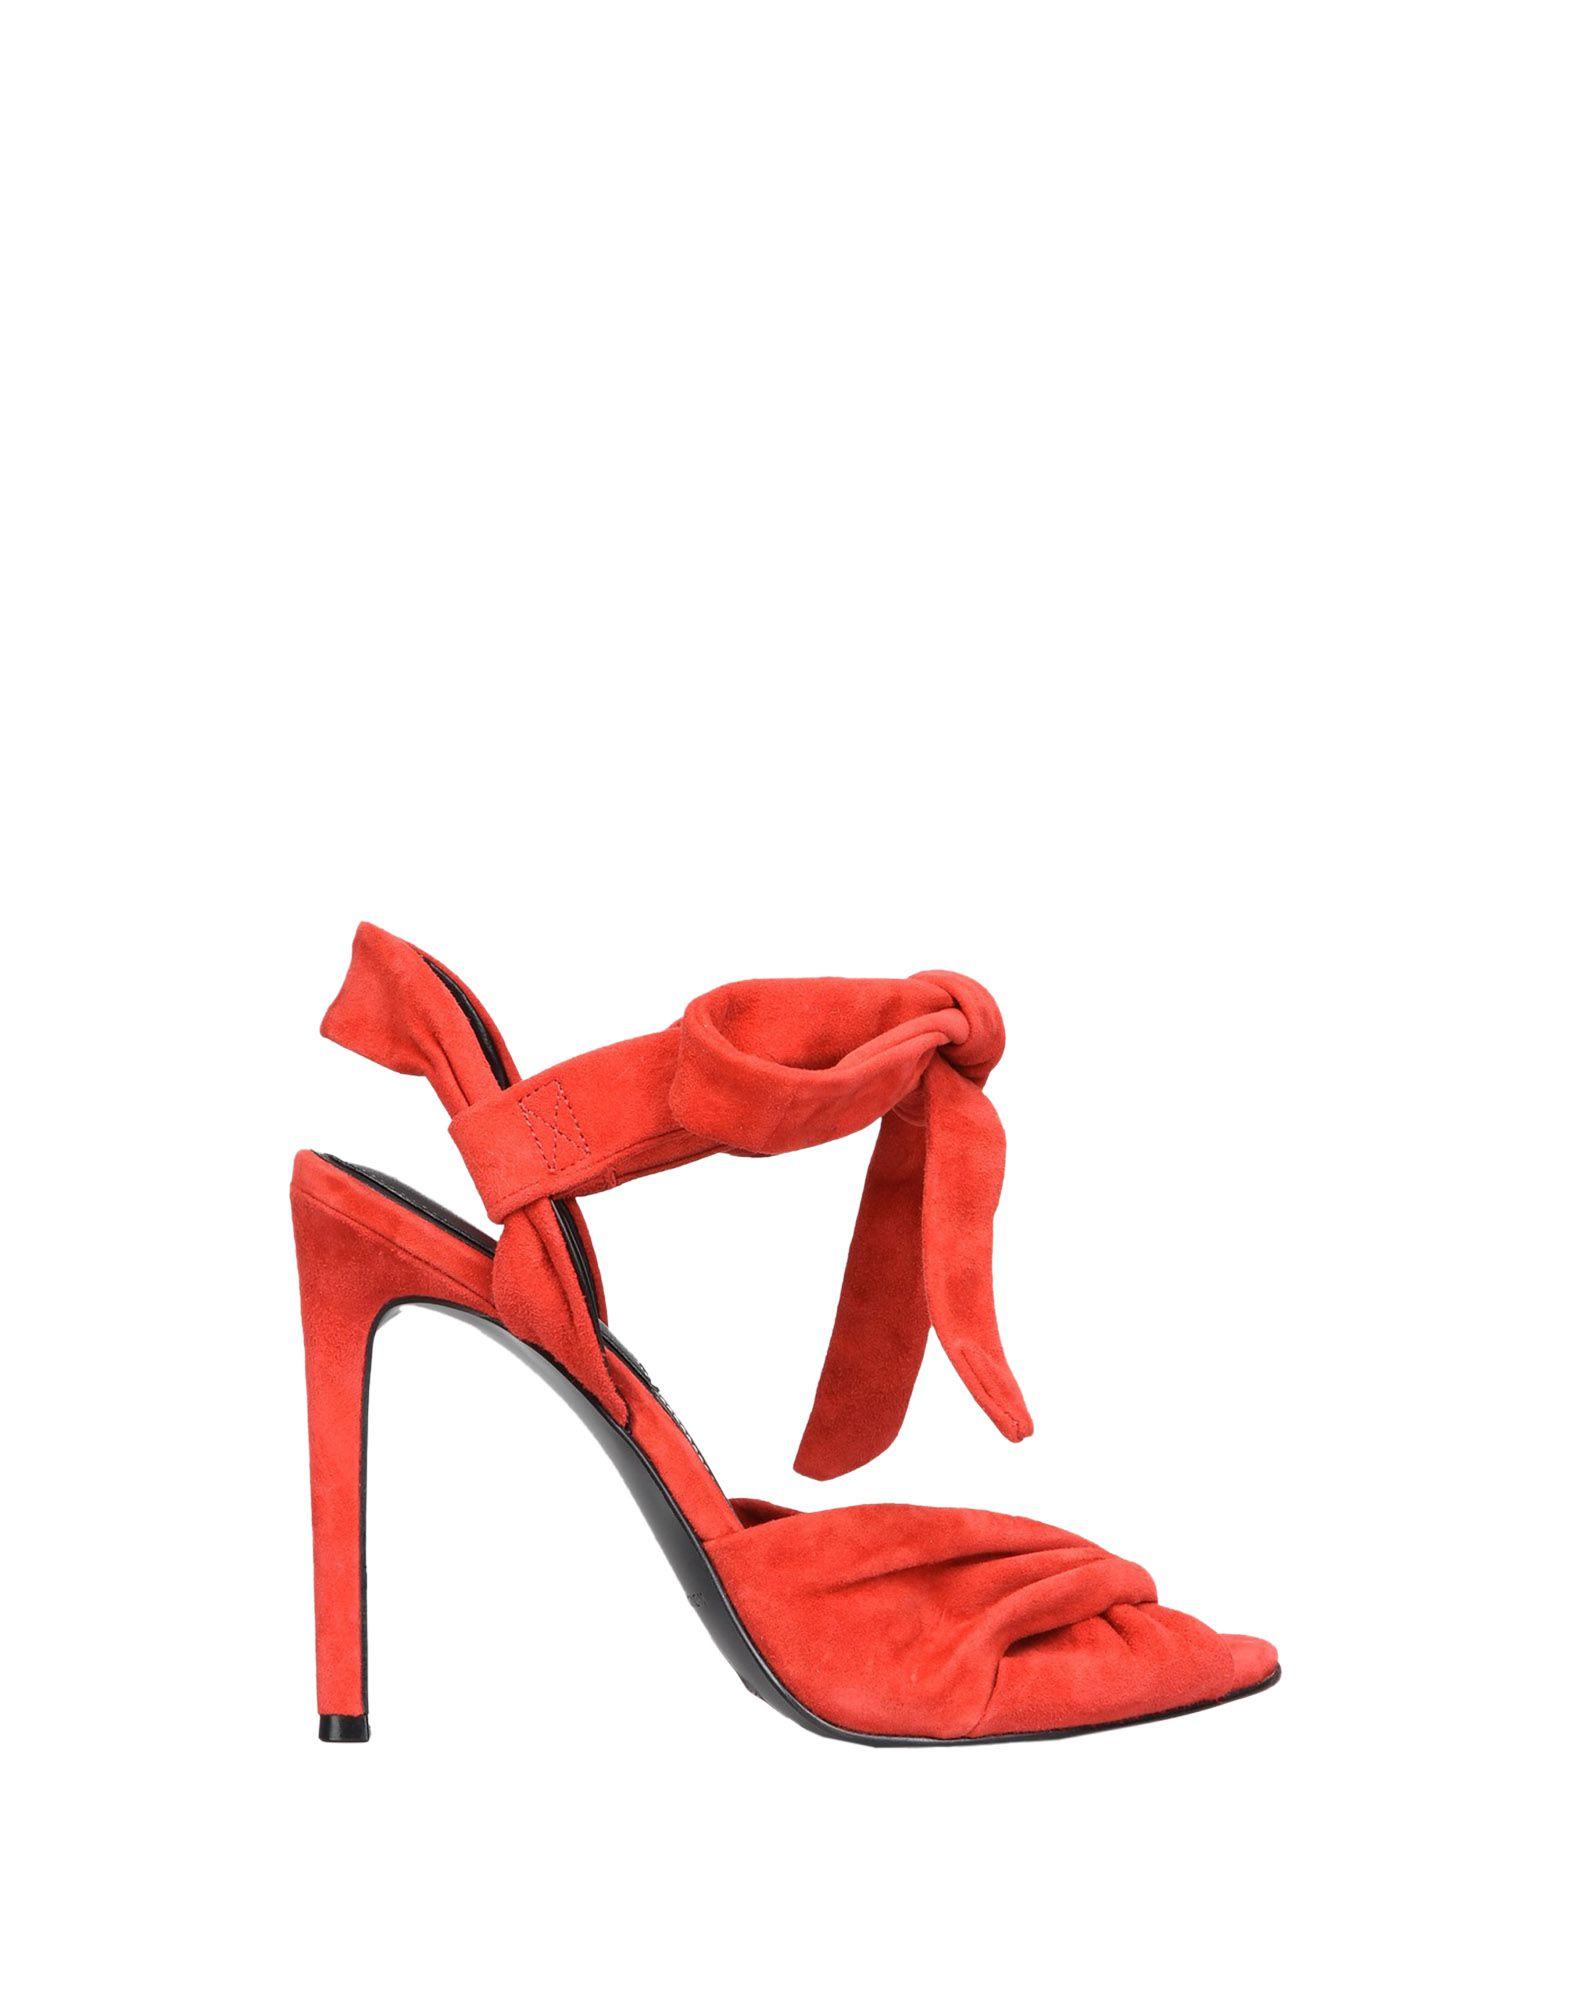 Kendall 11253906ME + Kylie Kkdelilah/03  11253906ME Kendall Gute Qualität beliebte Schuhe 8399be